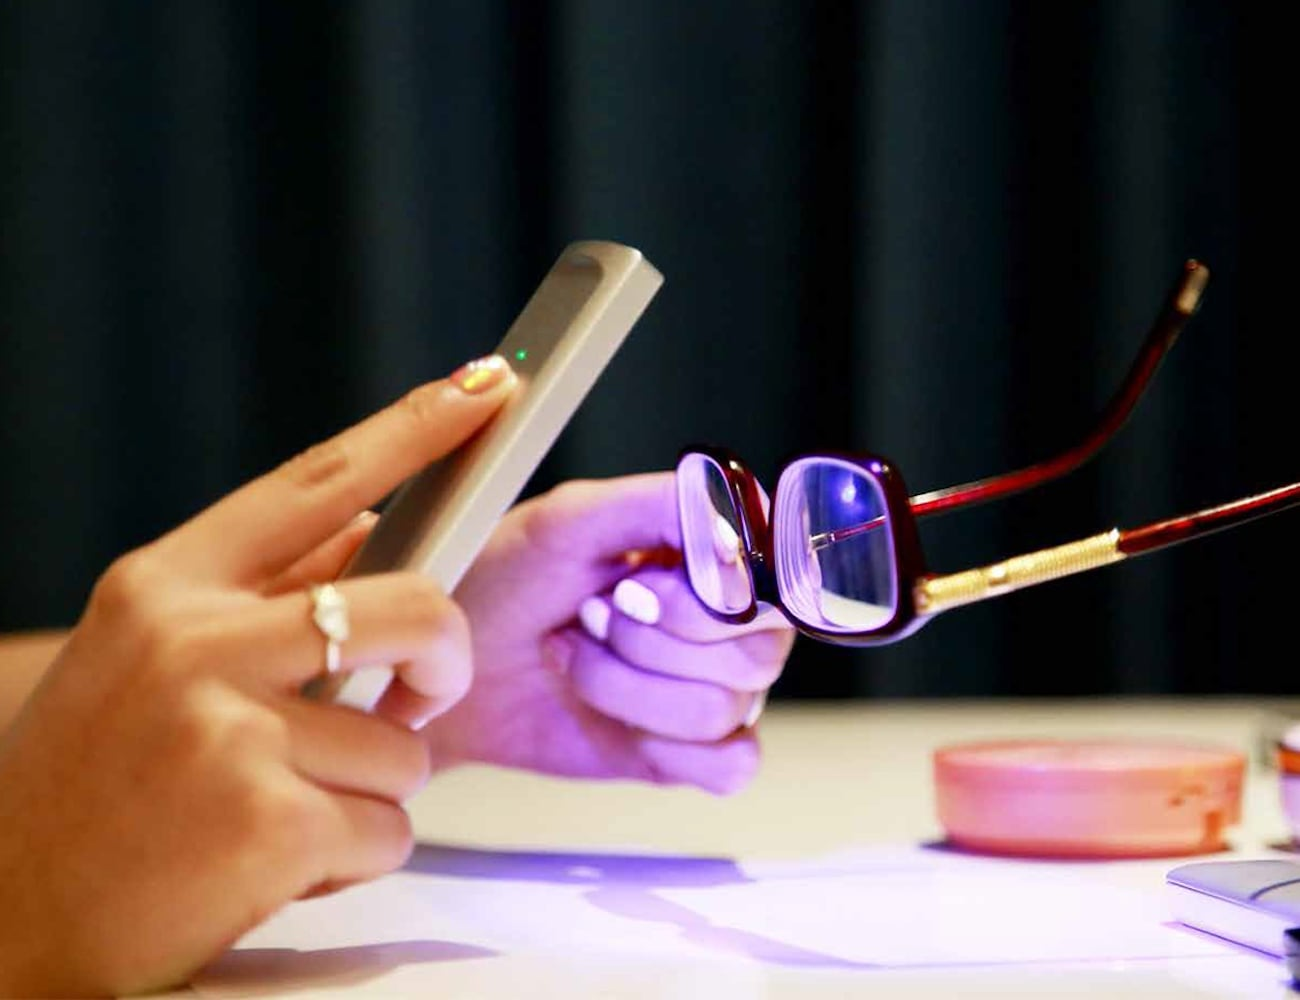 Raycono Portable UVC LED Sterilizer